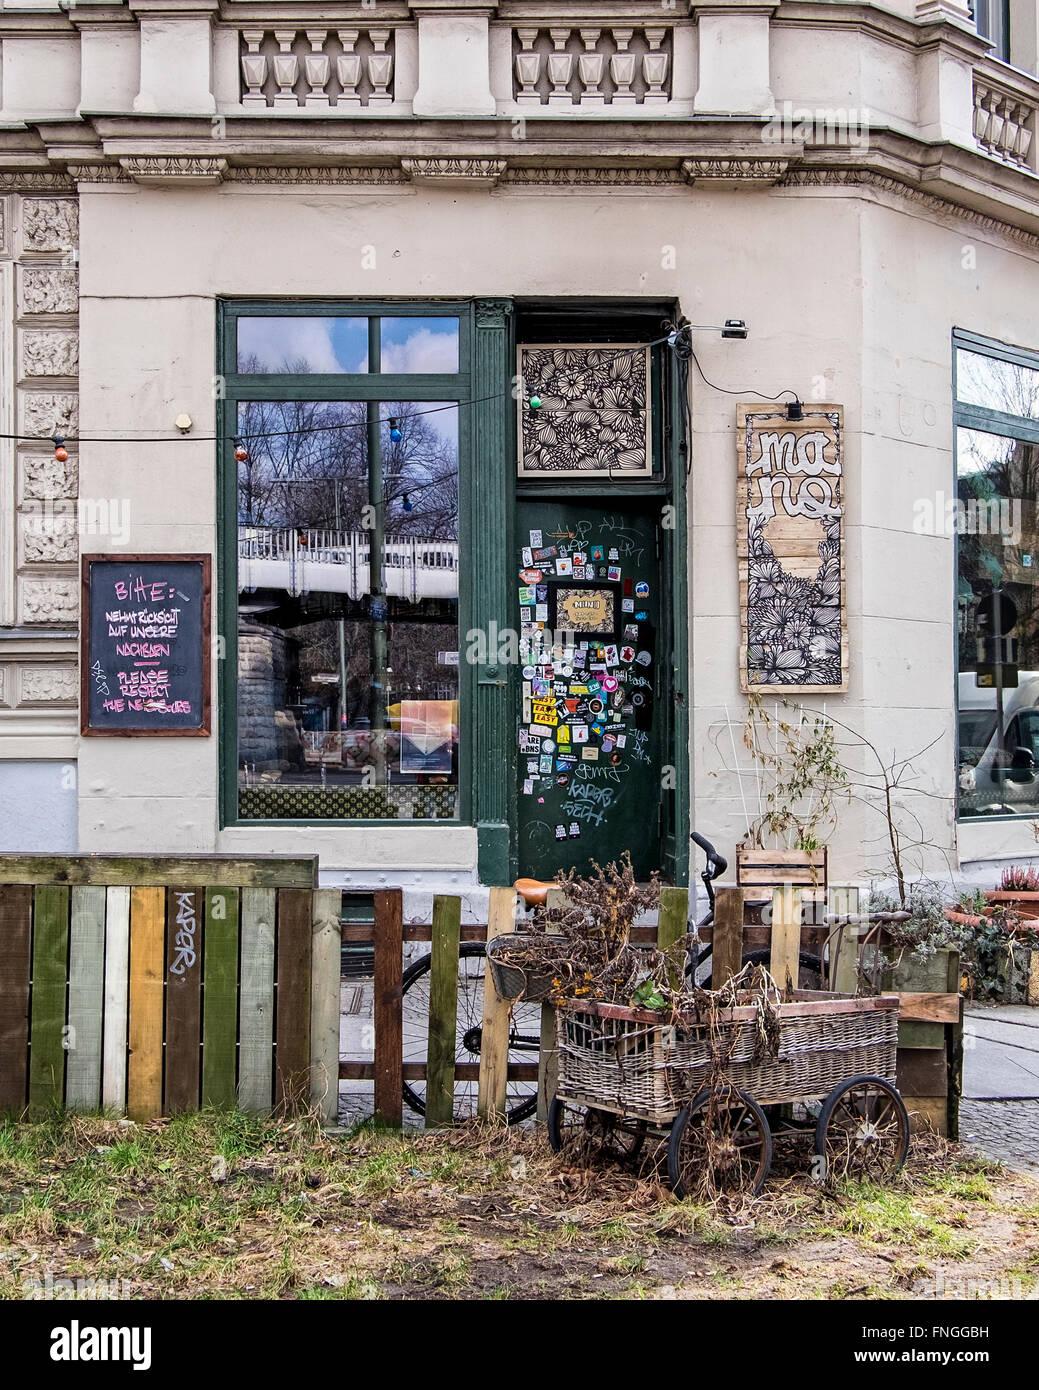 Berlín, Kreuzberg, Friedrichshain-Kreuzberg. Mano bar exterior, antiguo edificio, entrada, puerta, pegatinas Imagen De Stock